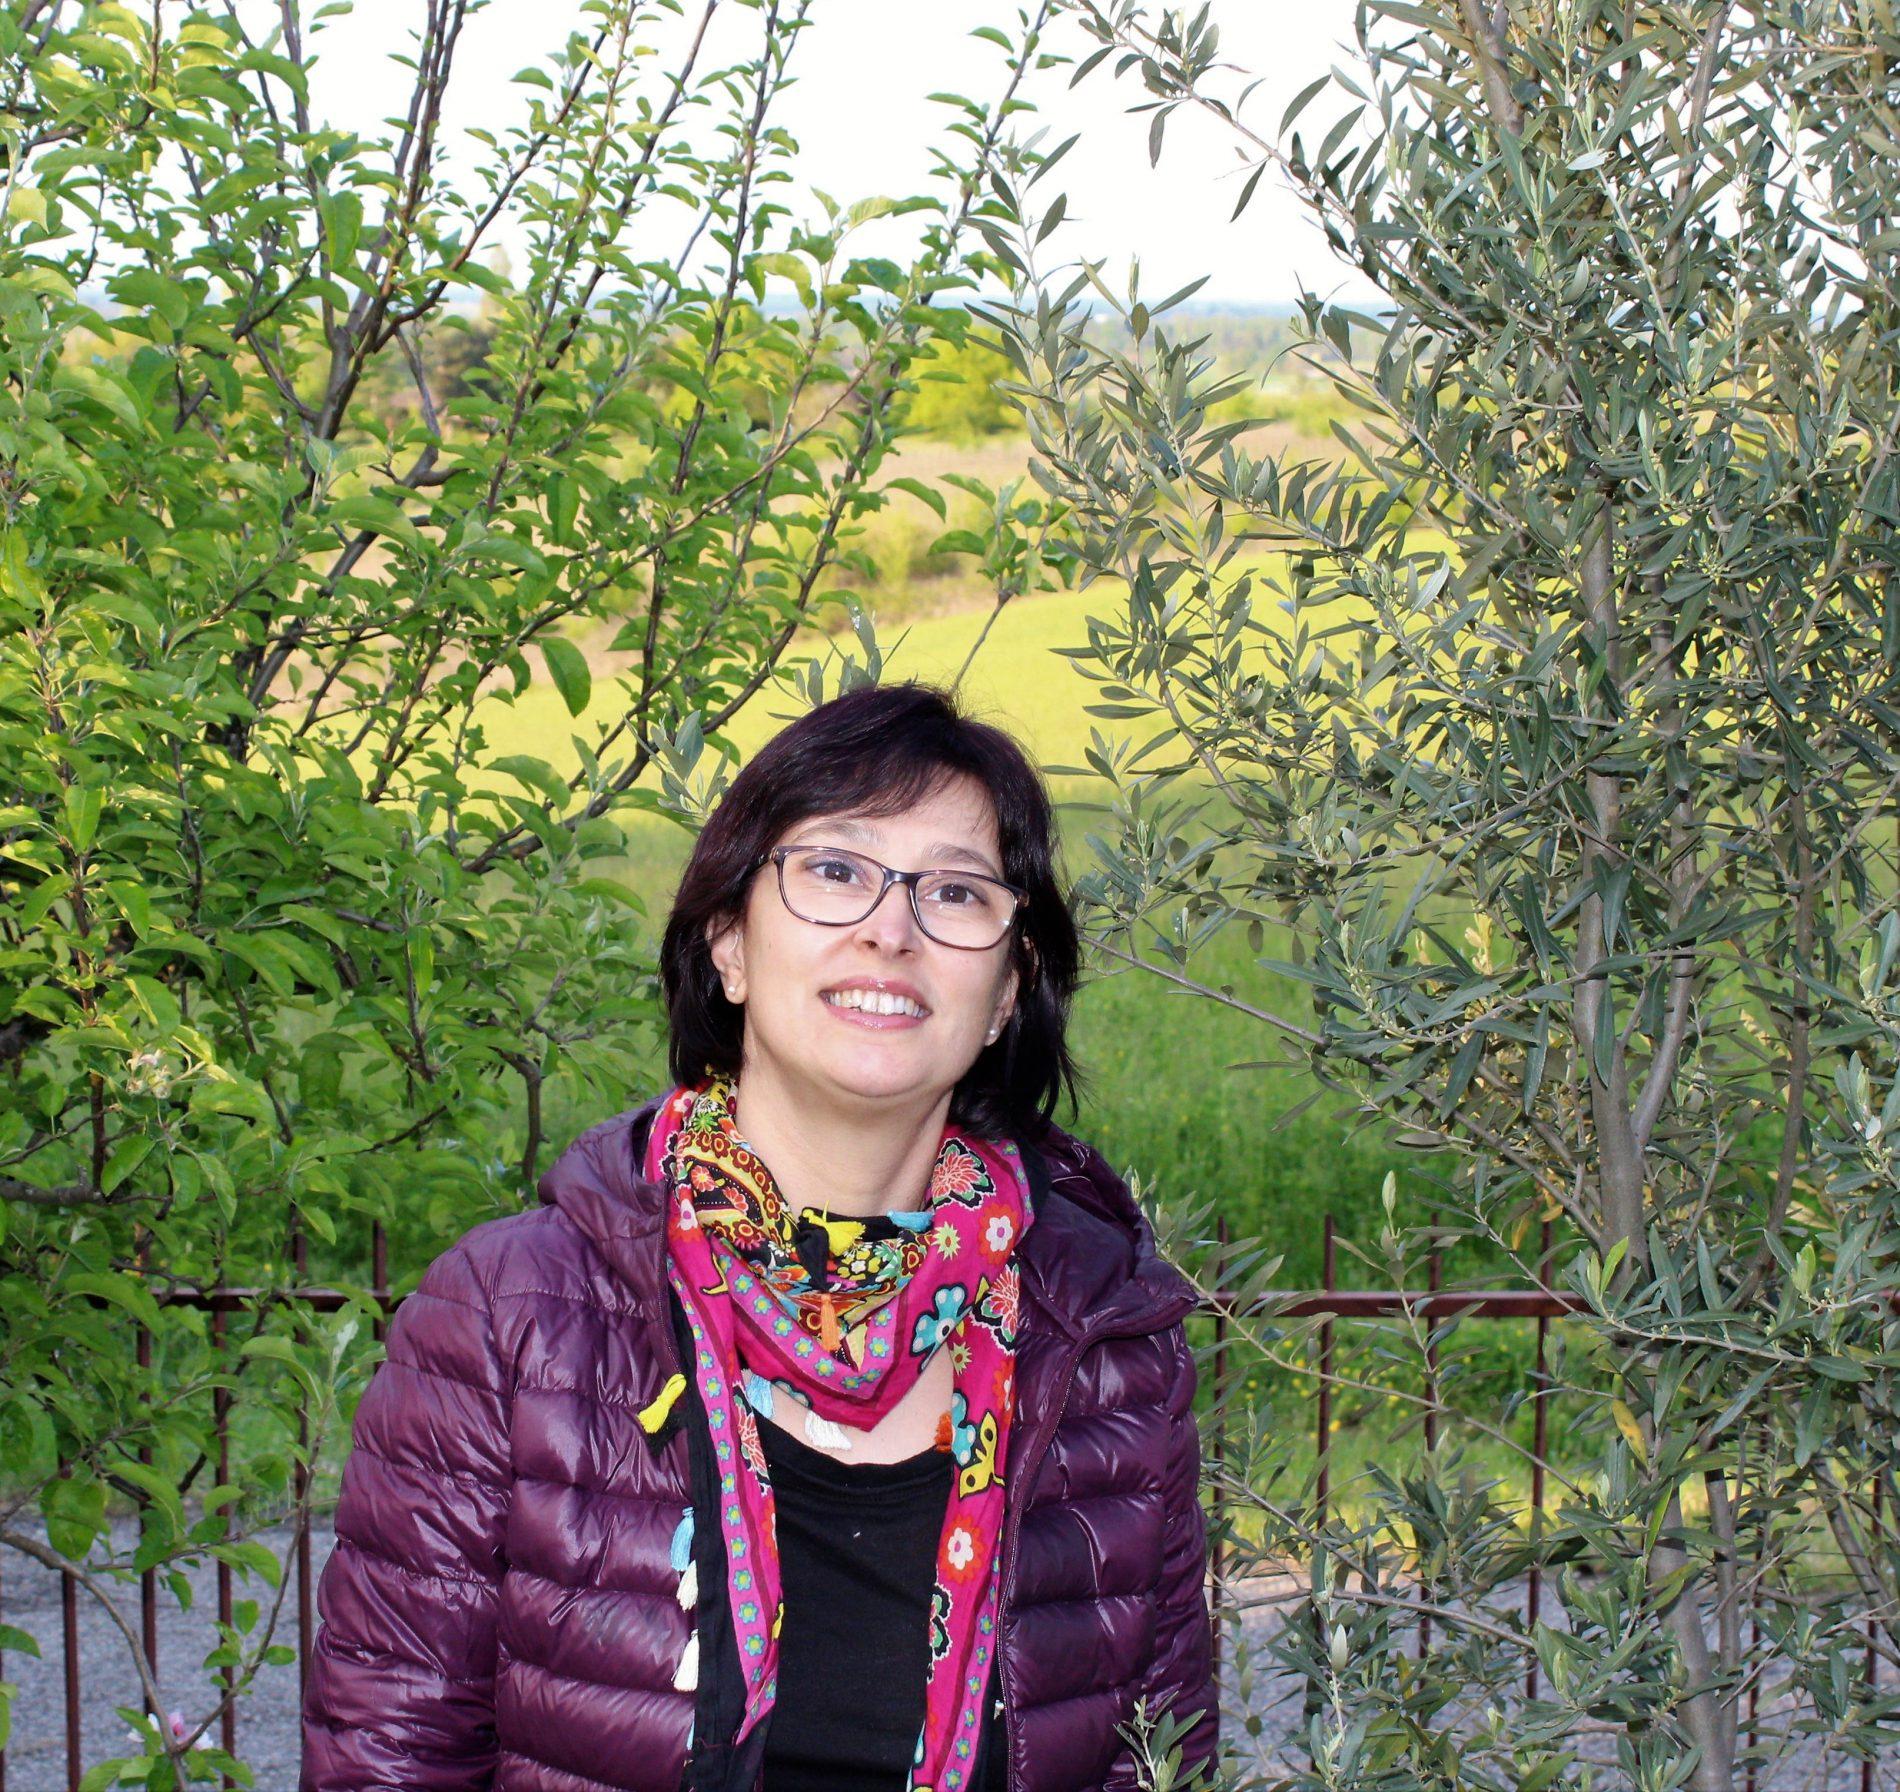 Benedetta Bernardi